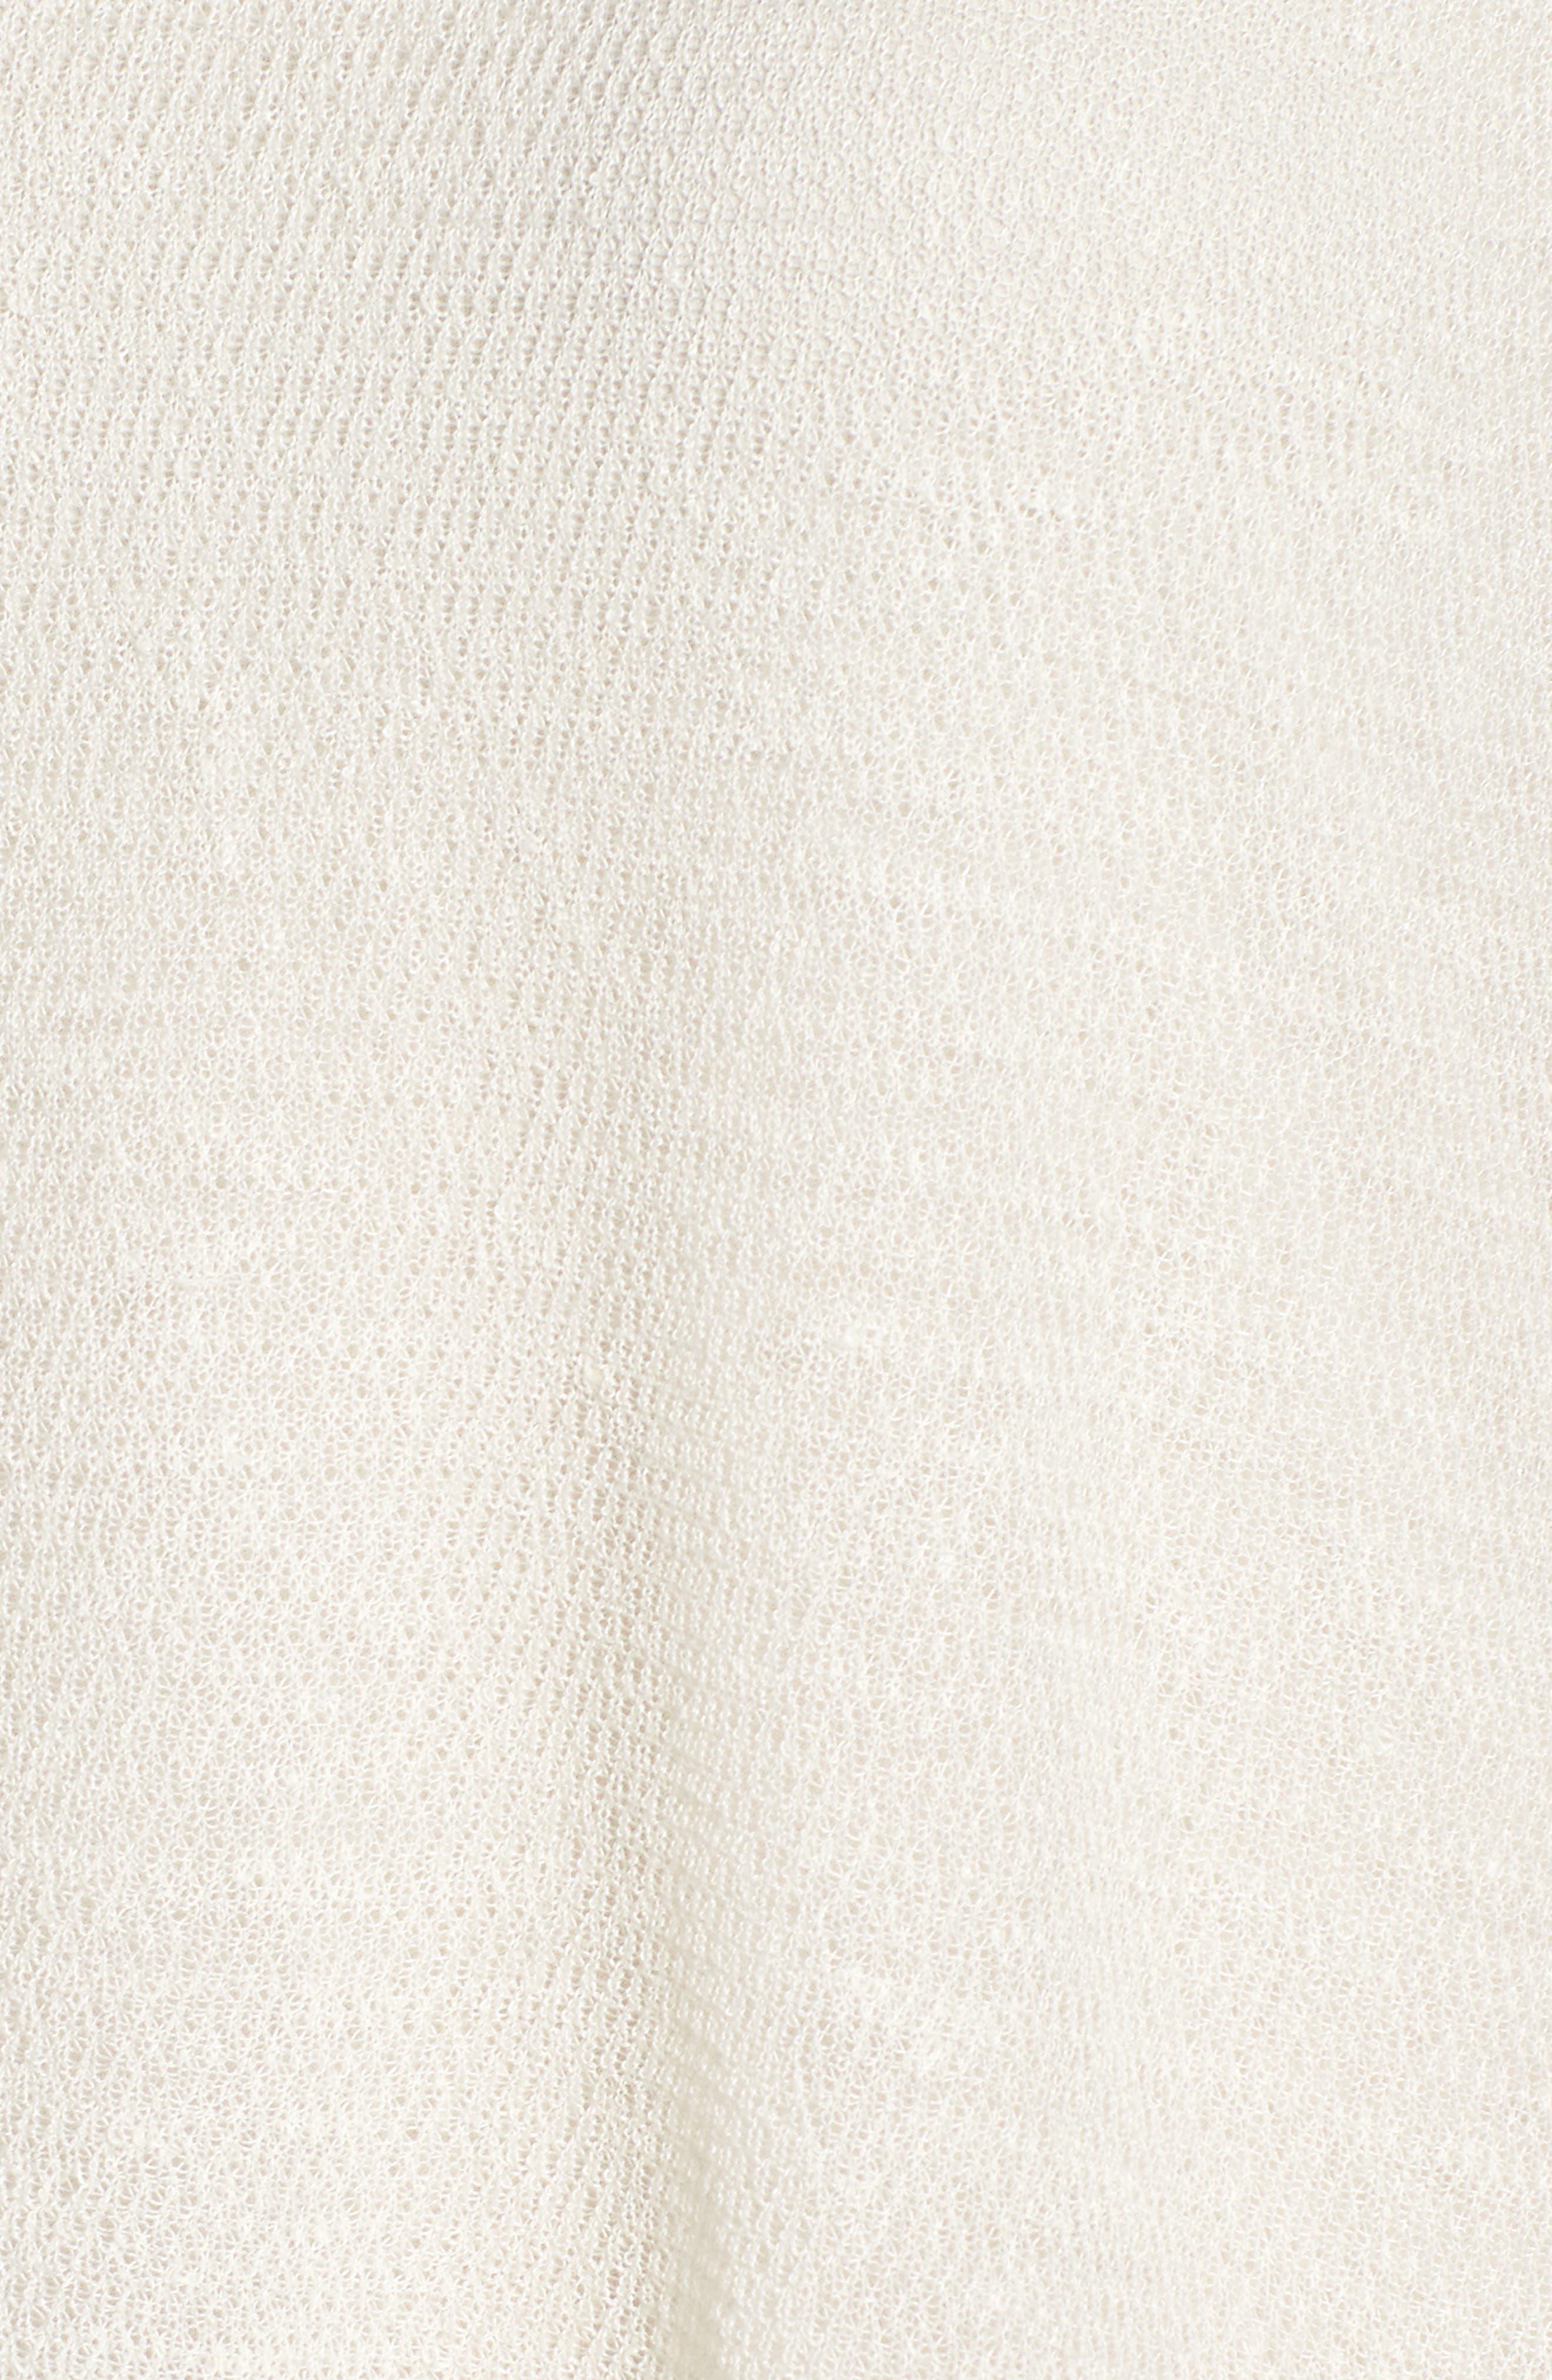 Sheer Asymmetrical Cap Sleeve Sweater,                             Alternate thumbnail 5, color,                             907